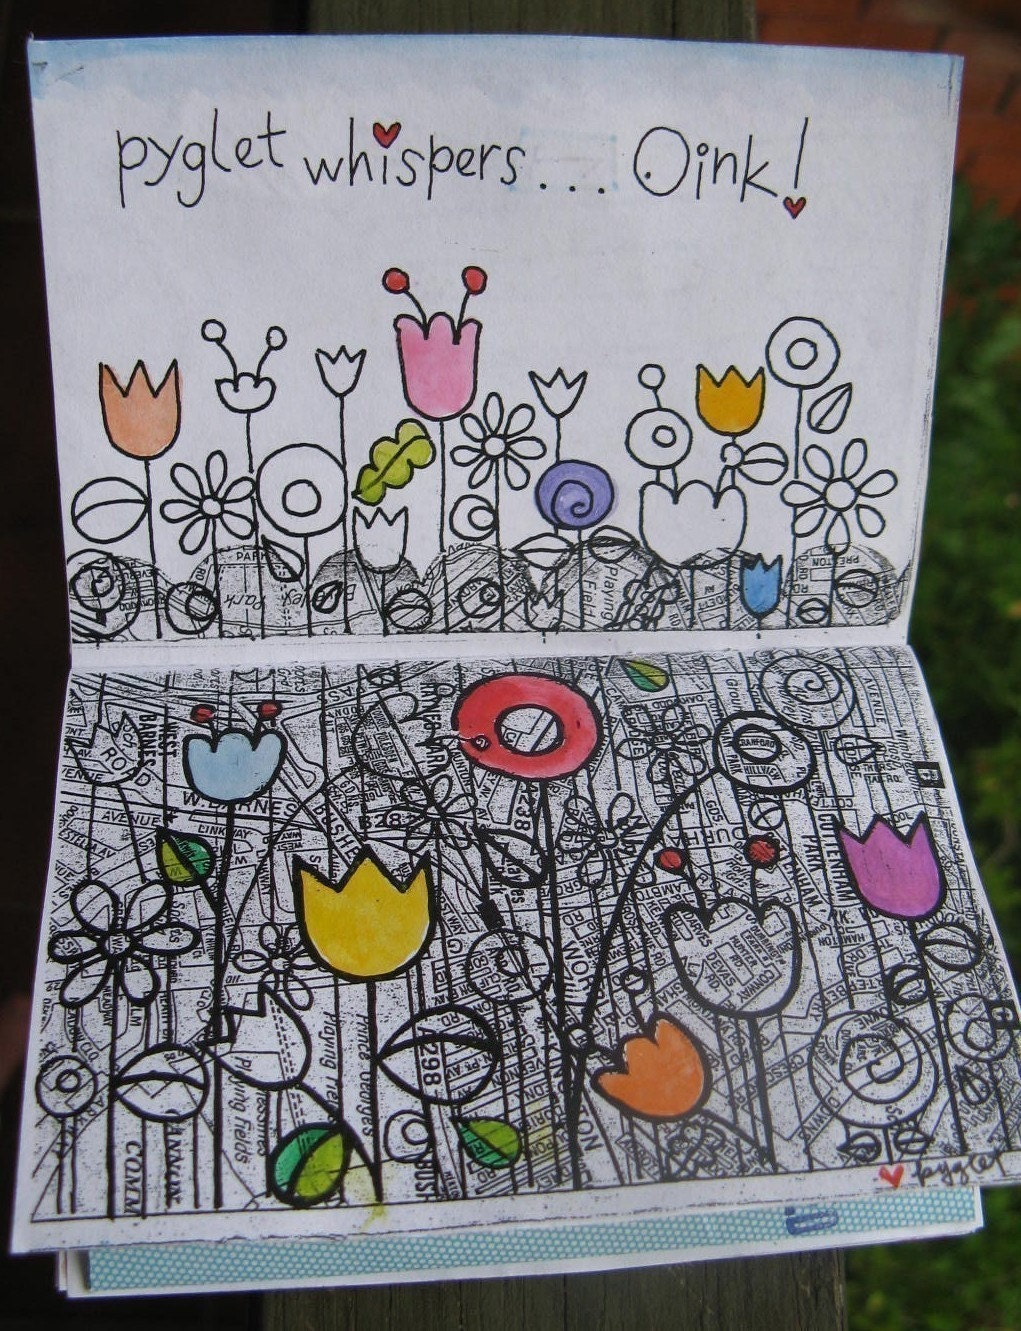 OINK - art zine - vol 1 -  pyglet whispers